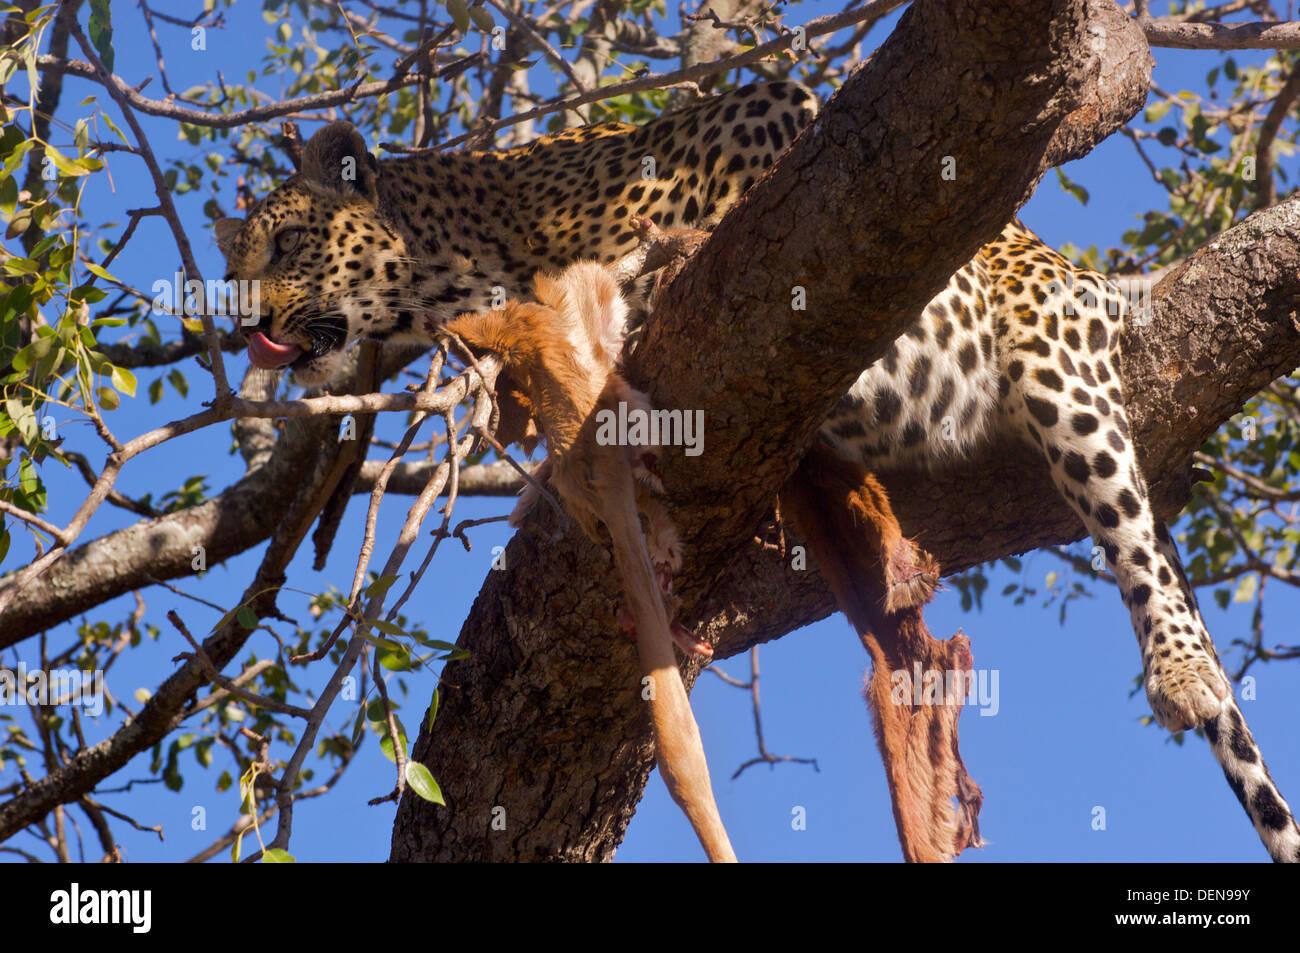 Leopard (Panthera pardus) feeding on impala stashed high in a tree, Londolozi, Sabi Sand, South Africa. - Stock Image